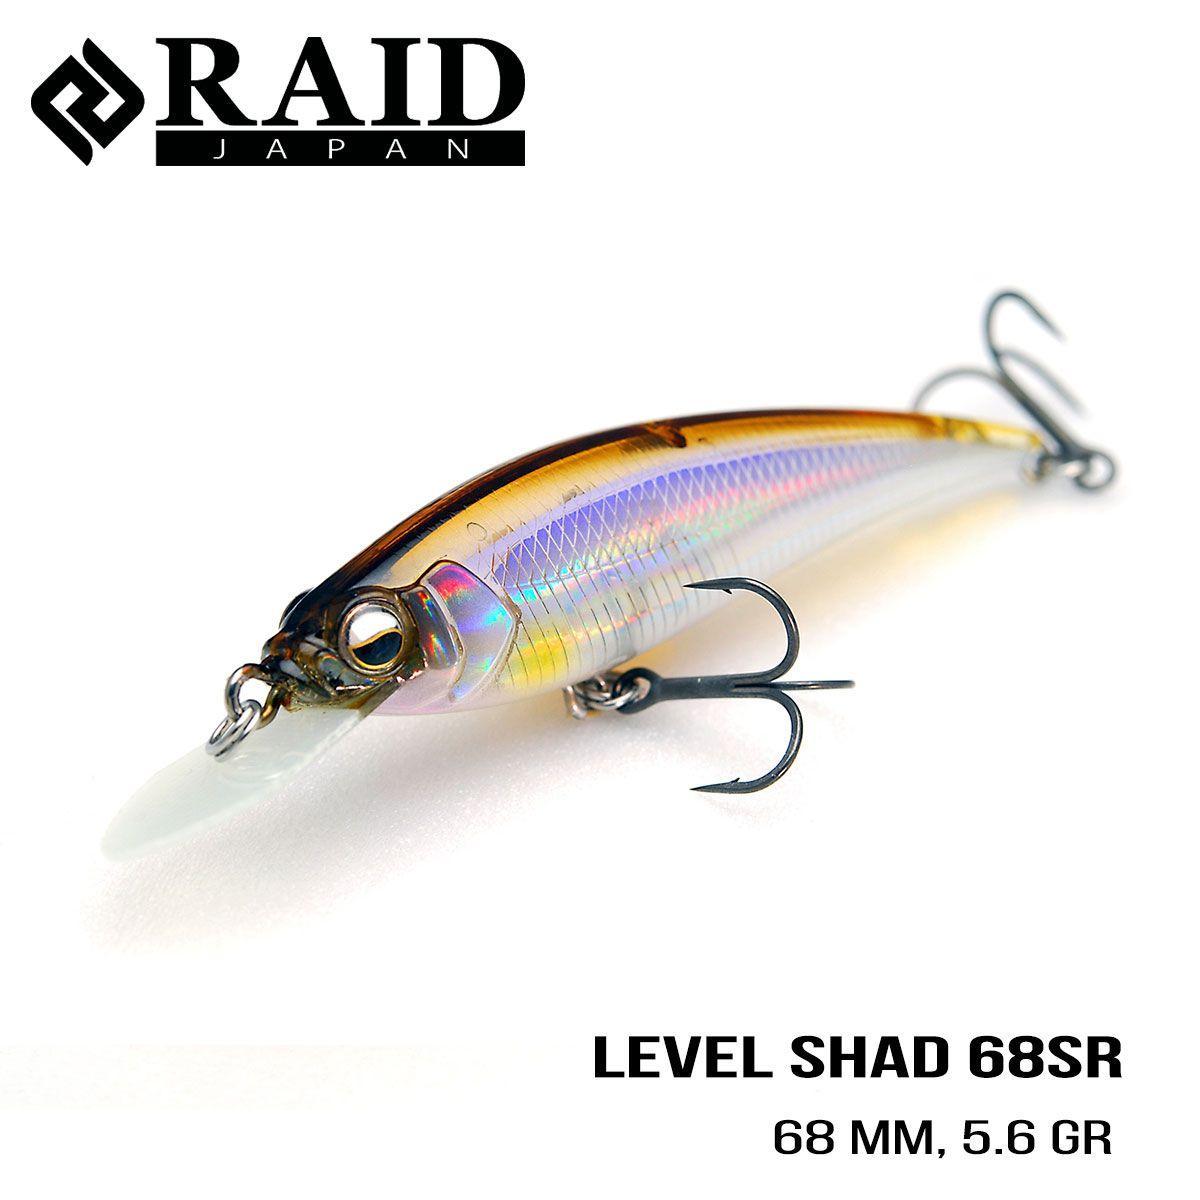 Воблер Raid Level Shad Sprinter 68SR (68mm, 5.6g) (009 Real Kinkuro)